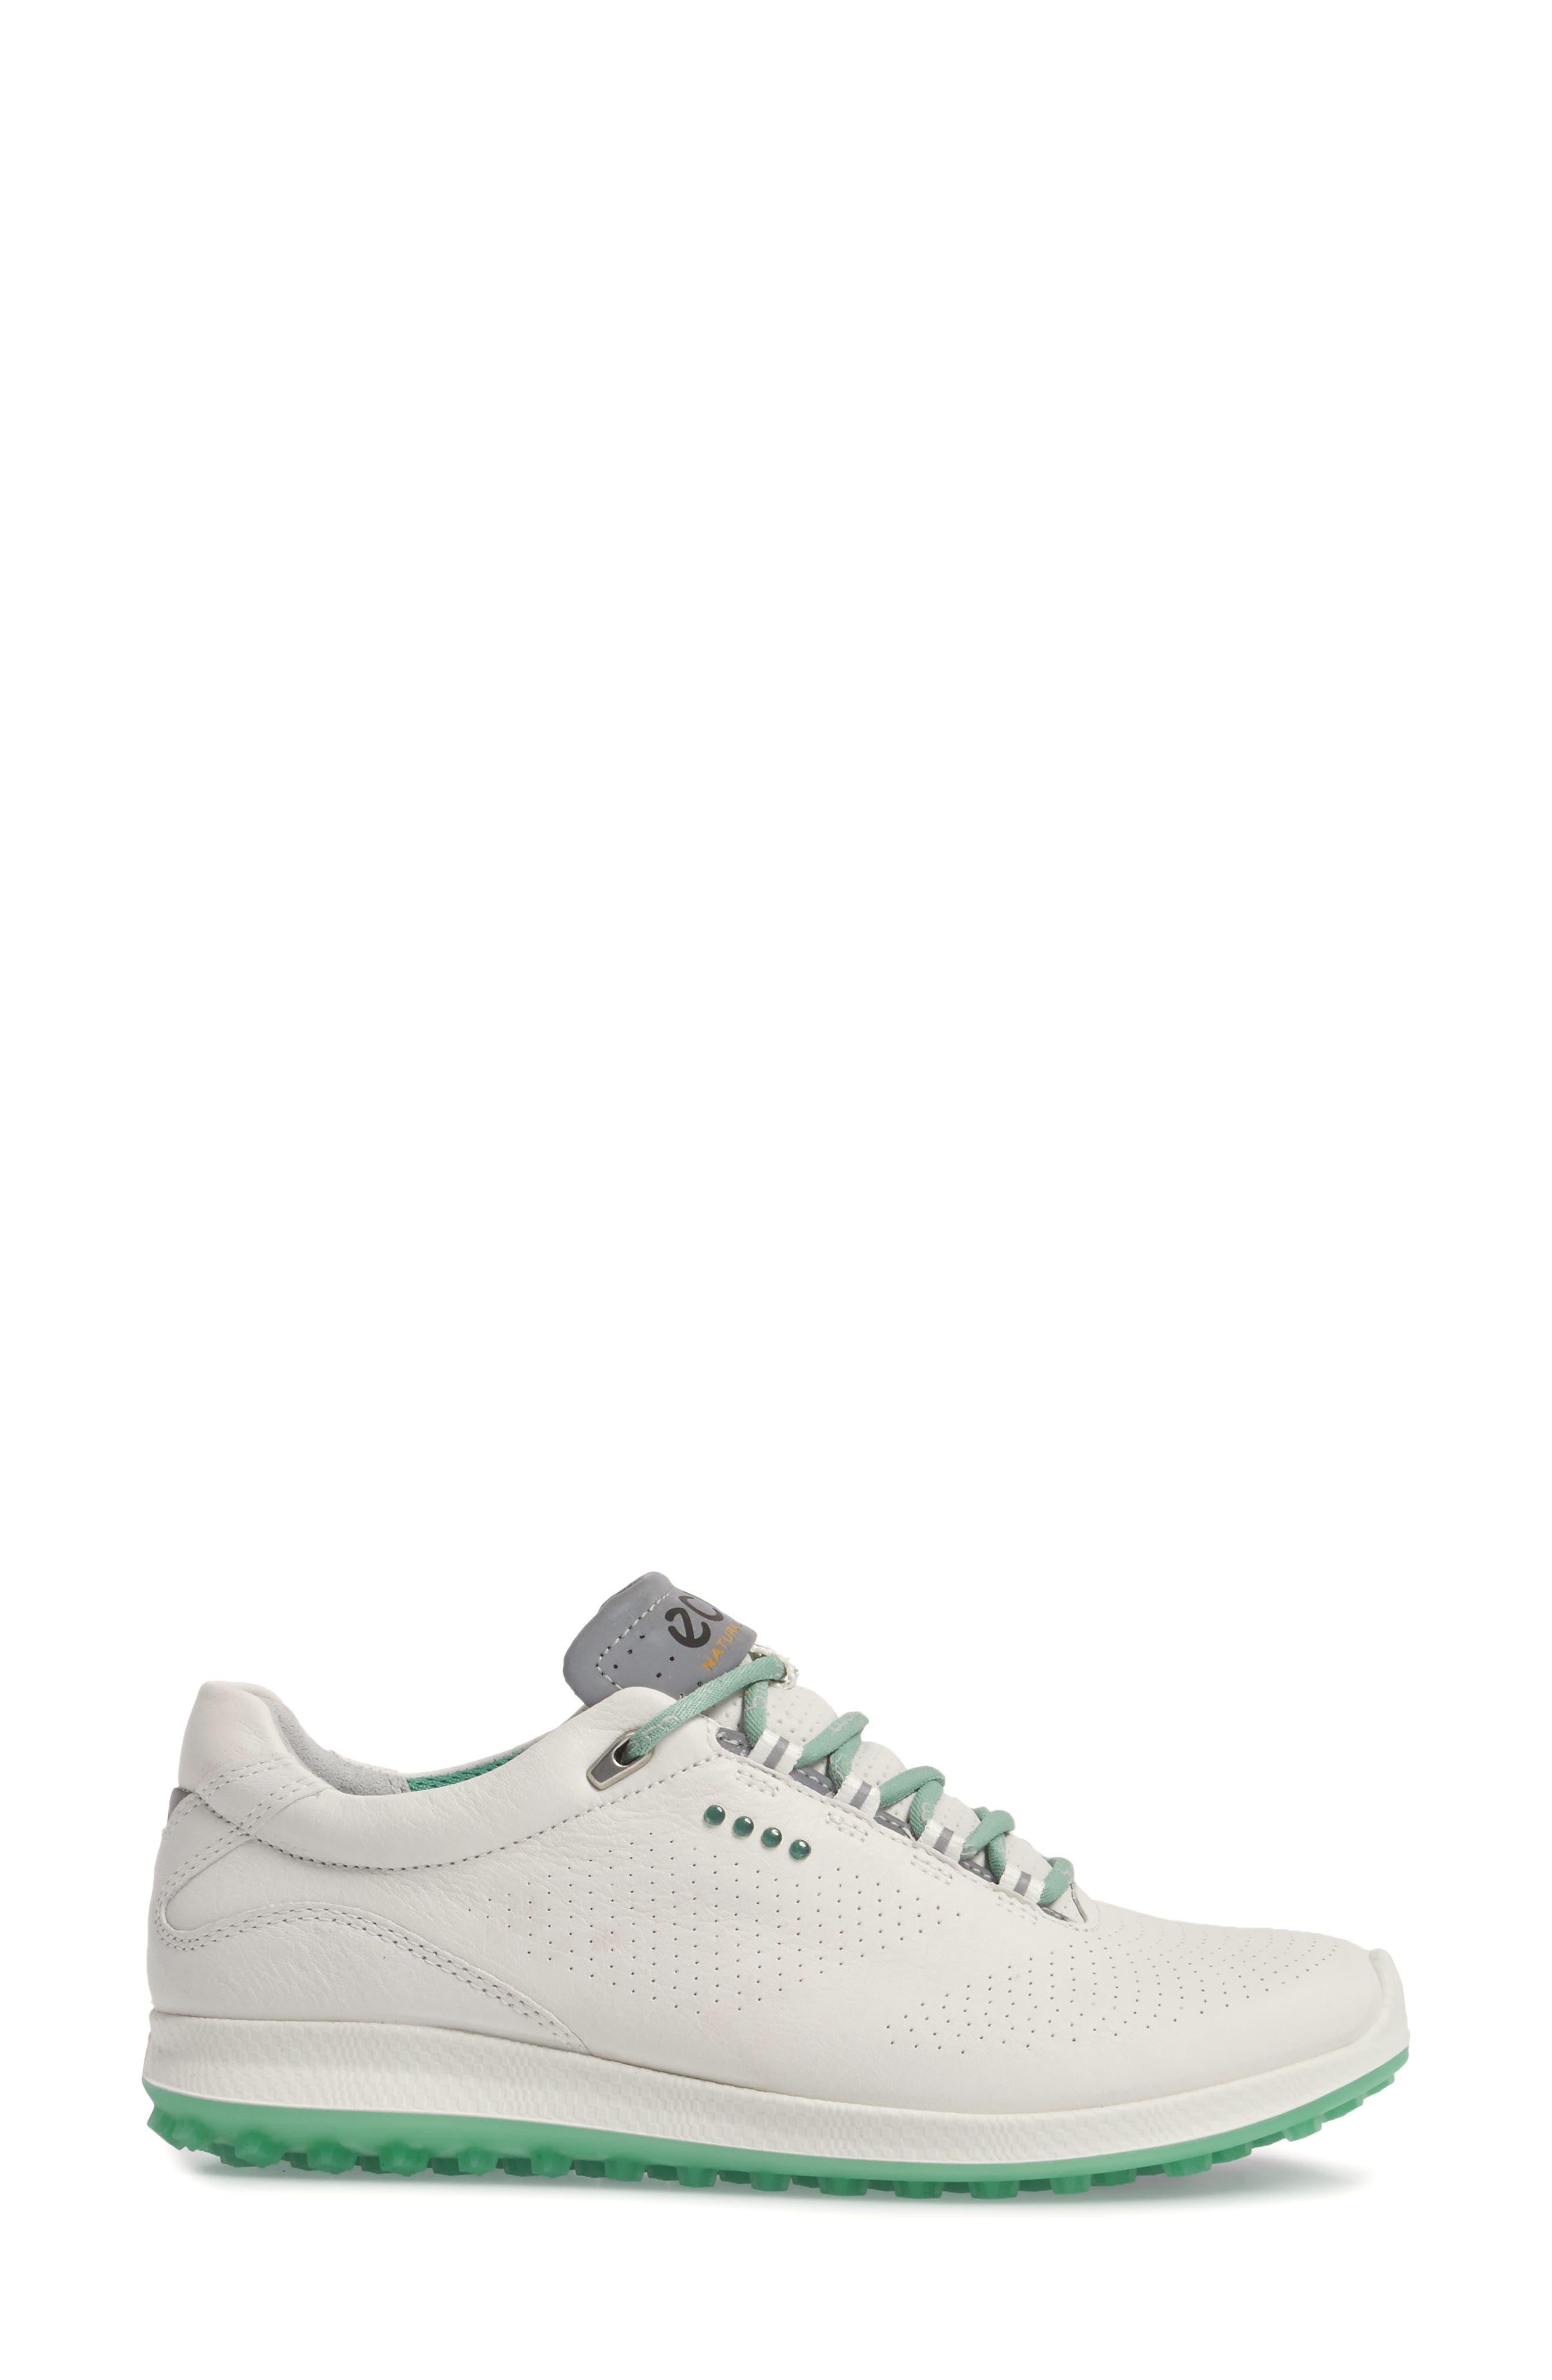 BIOM 2 Hybrid Water-Repellent Golf Shoe,                             Alternate thumbnail 3, color,                             WHITE/ GRANITE GREEN LEATHER